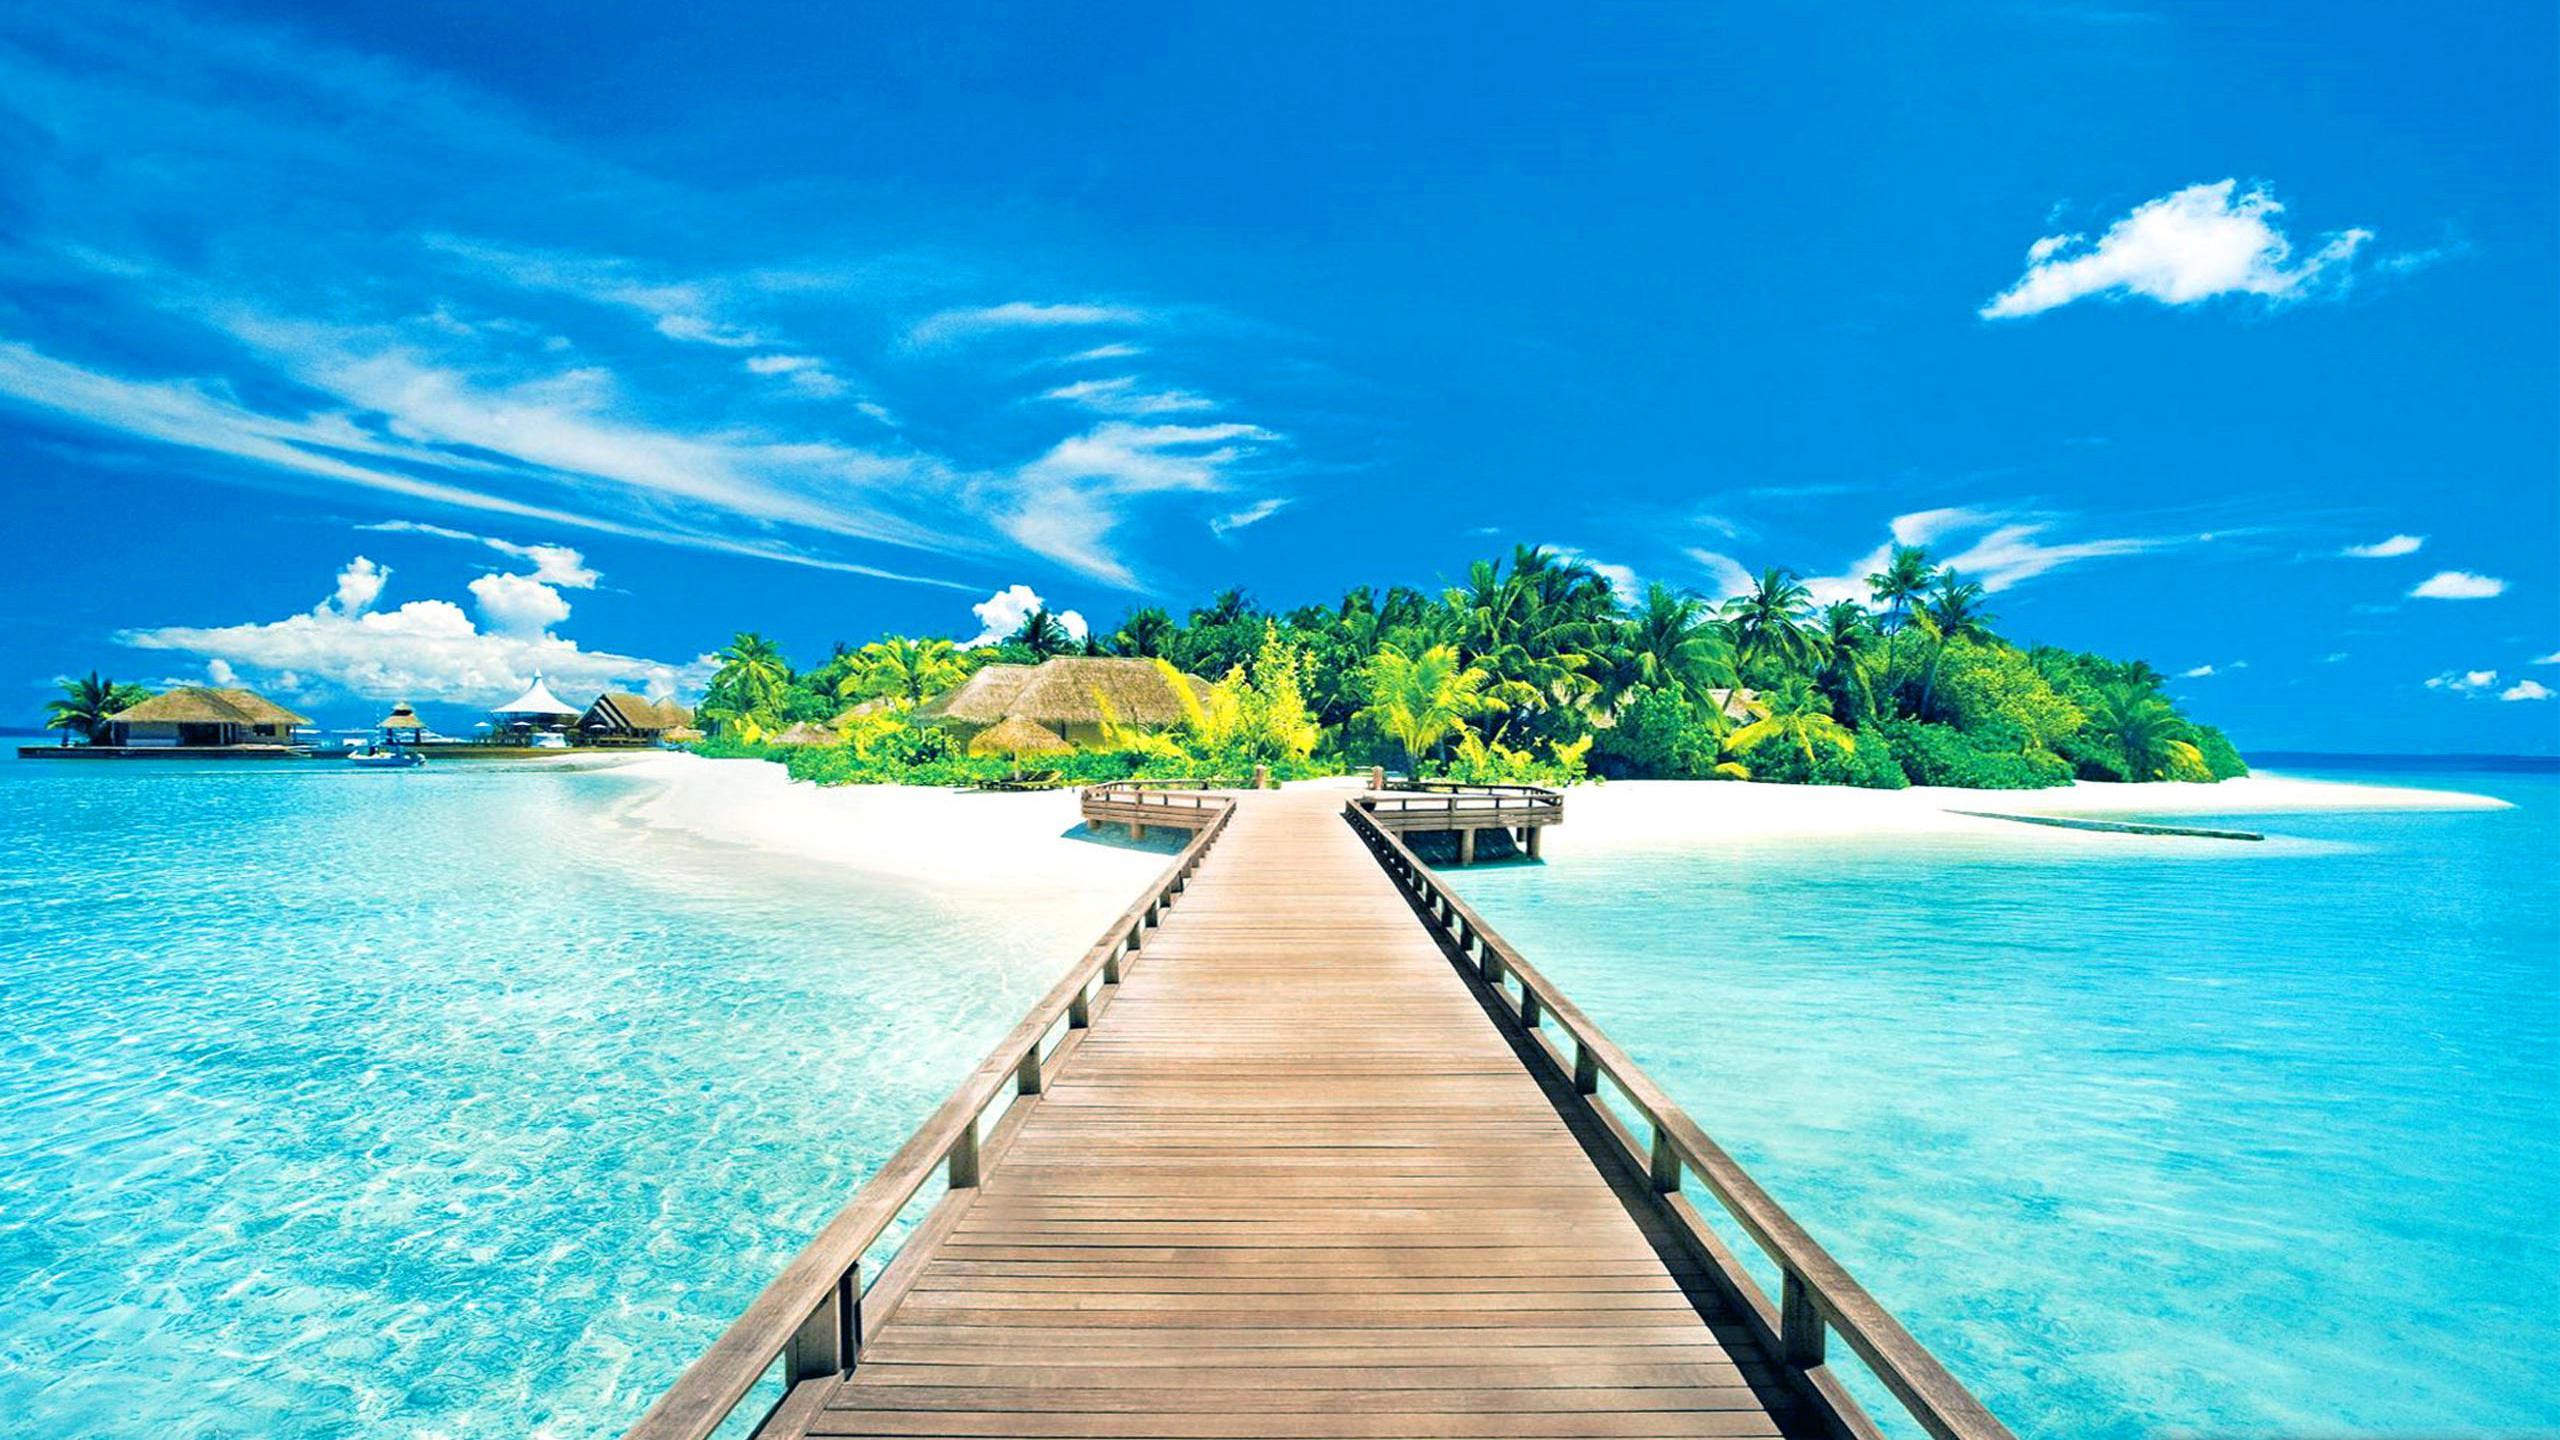 Pics Photos   Wallpaper Hd Tropical Island Backgrounds 2560x1440